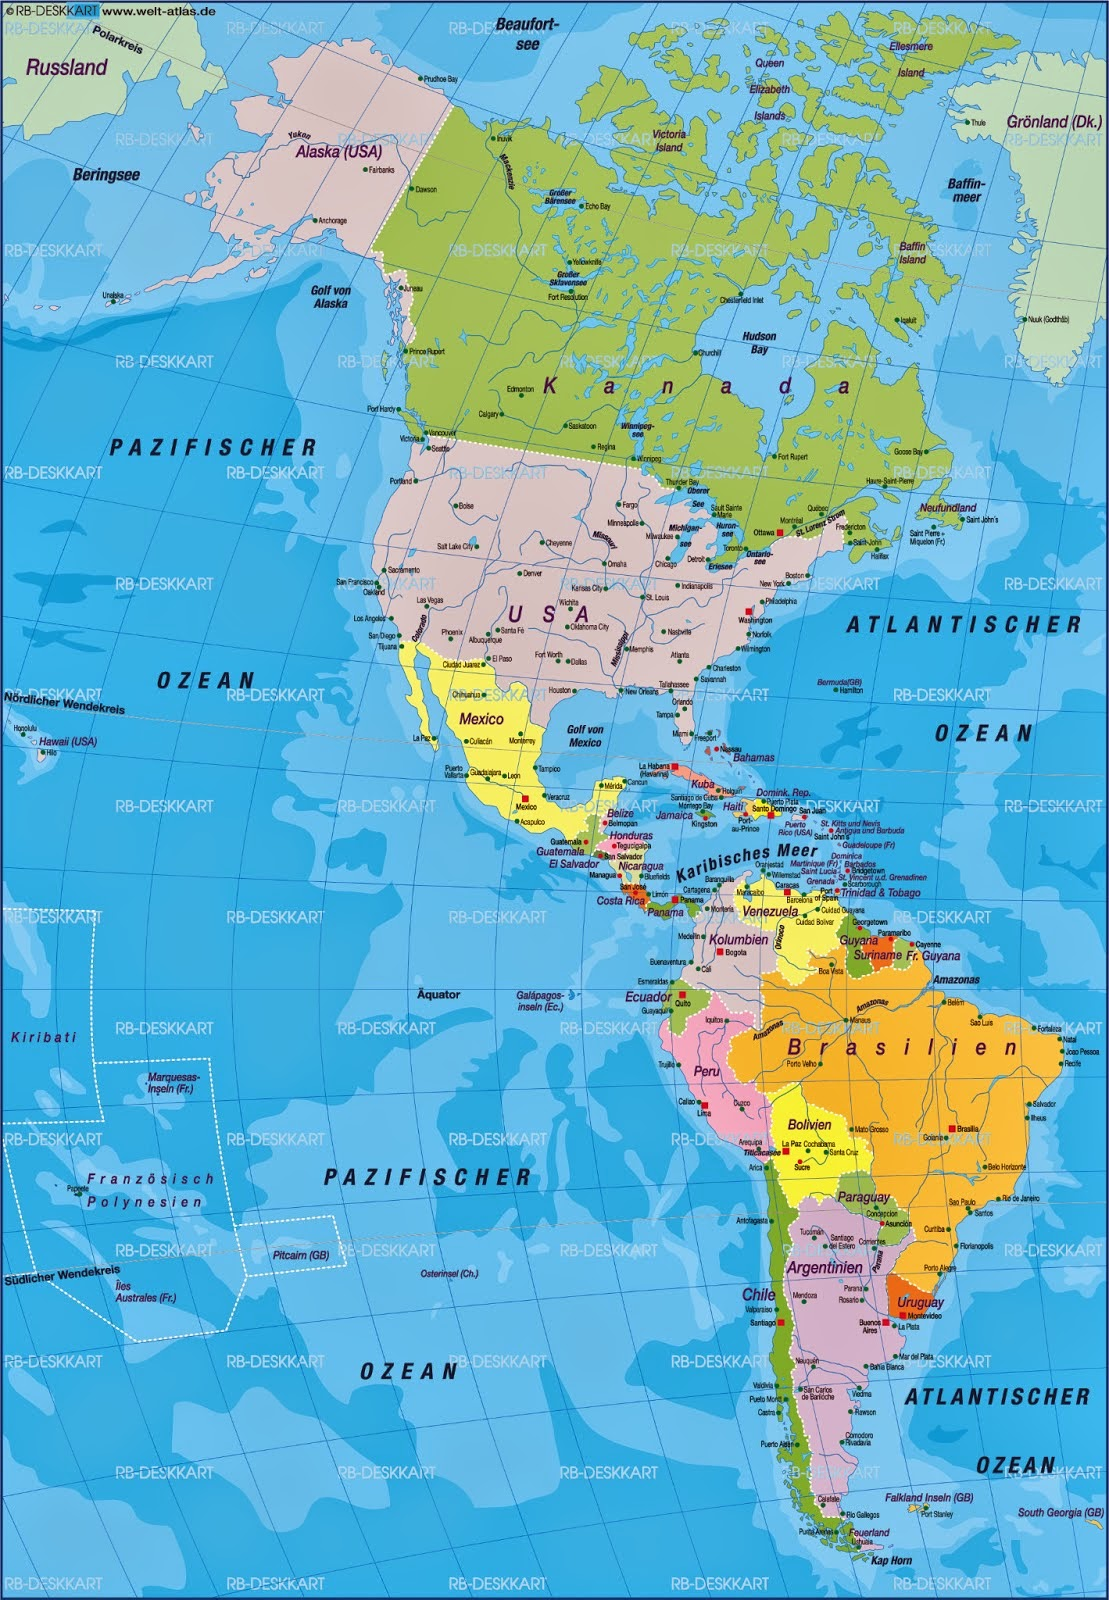 Keberadaan benua terkecil di dunia ini konon sudah diketahui semenjak jaman Romawi kuno Sejarah dan Asal Usul Nama Benua di Dunia